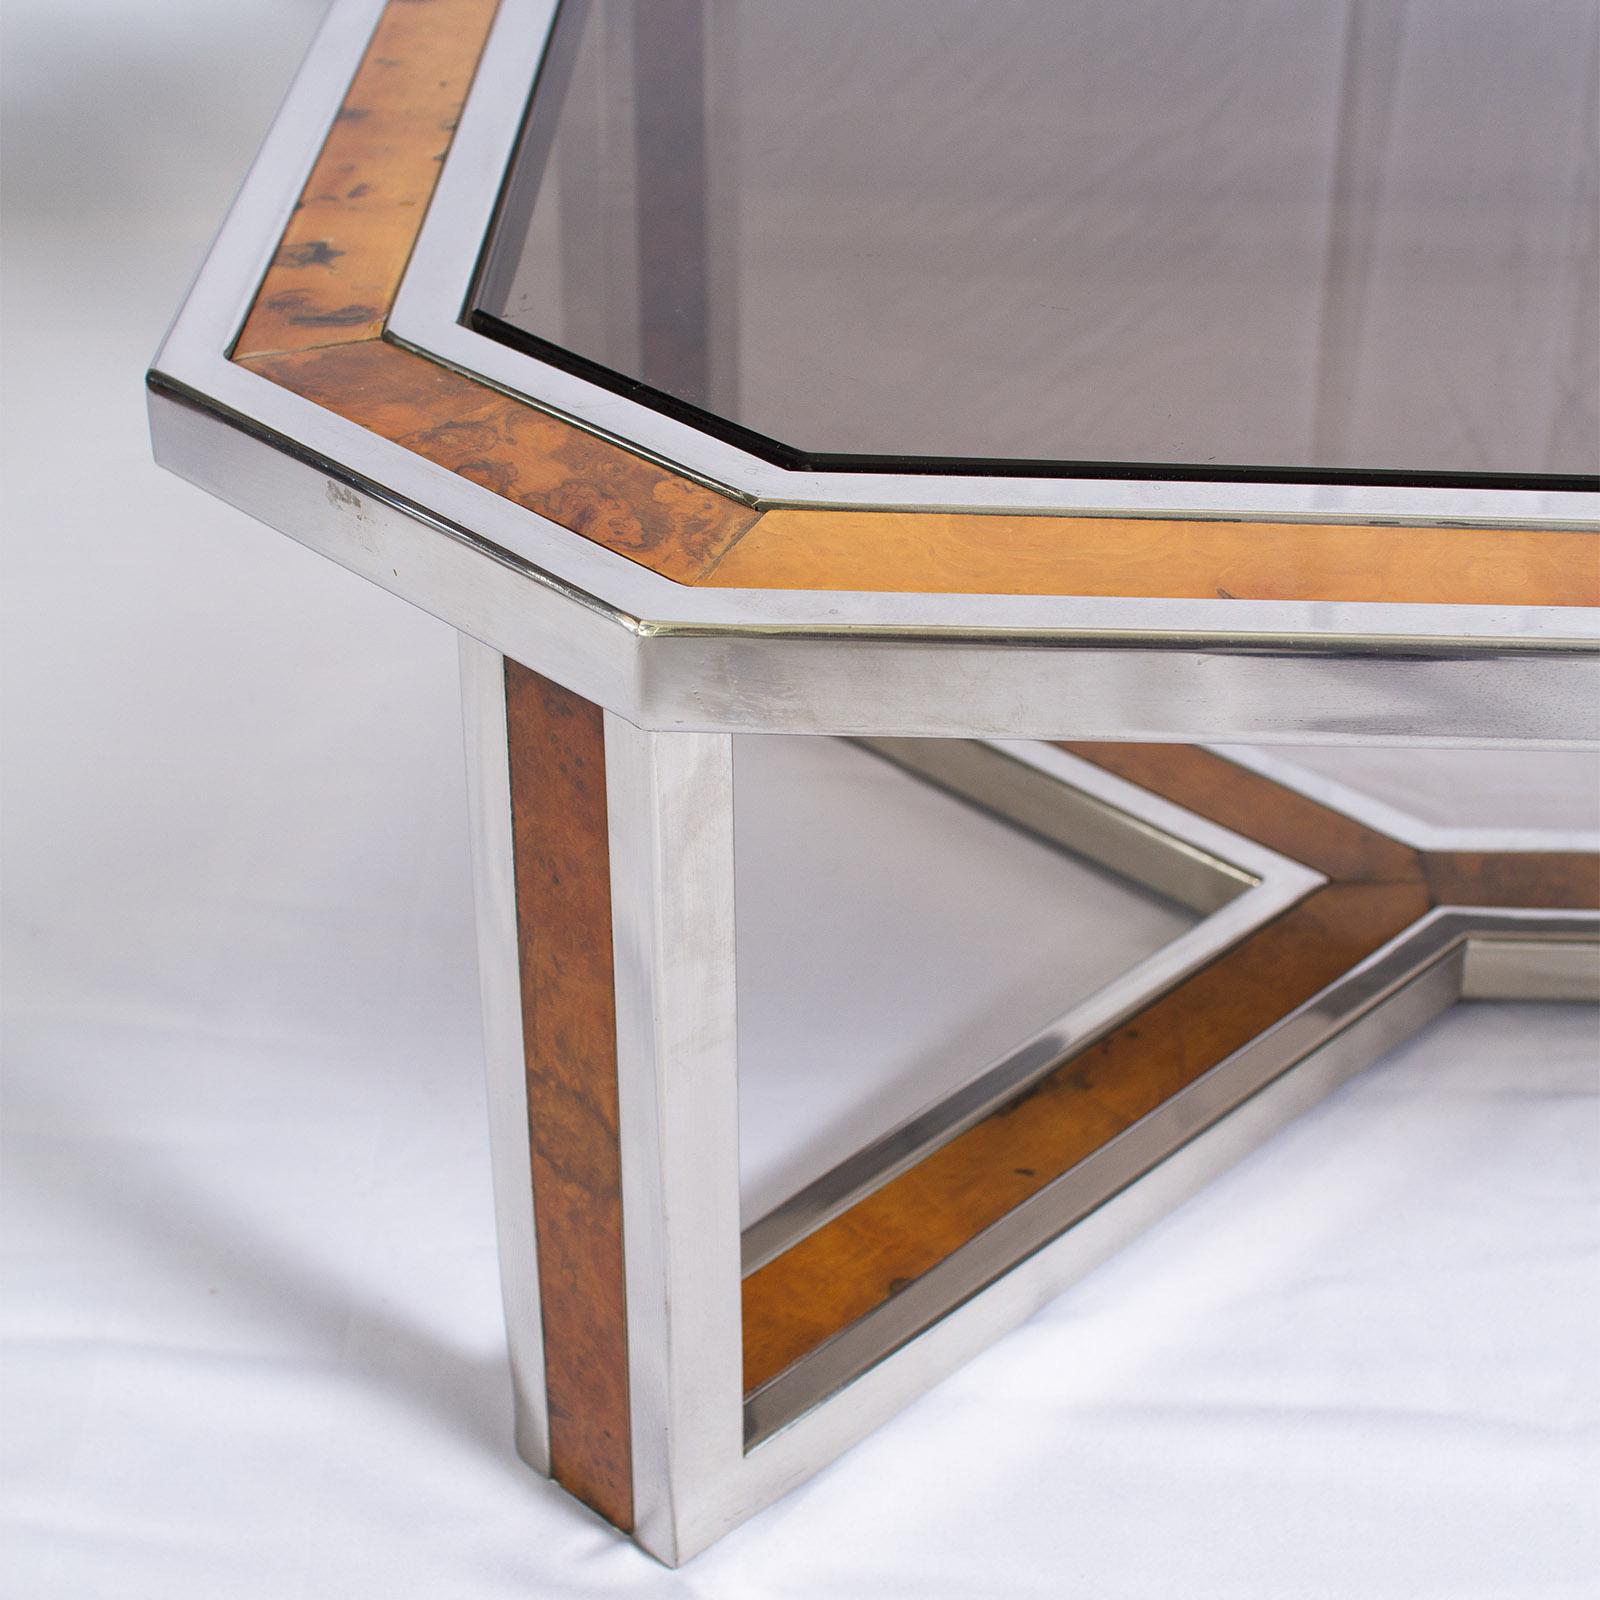 Wood And Chrome Pierceson Coffee Table: Coffee Table By Romeo Rega